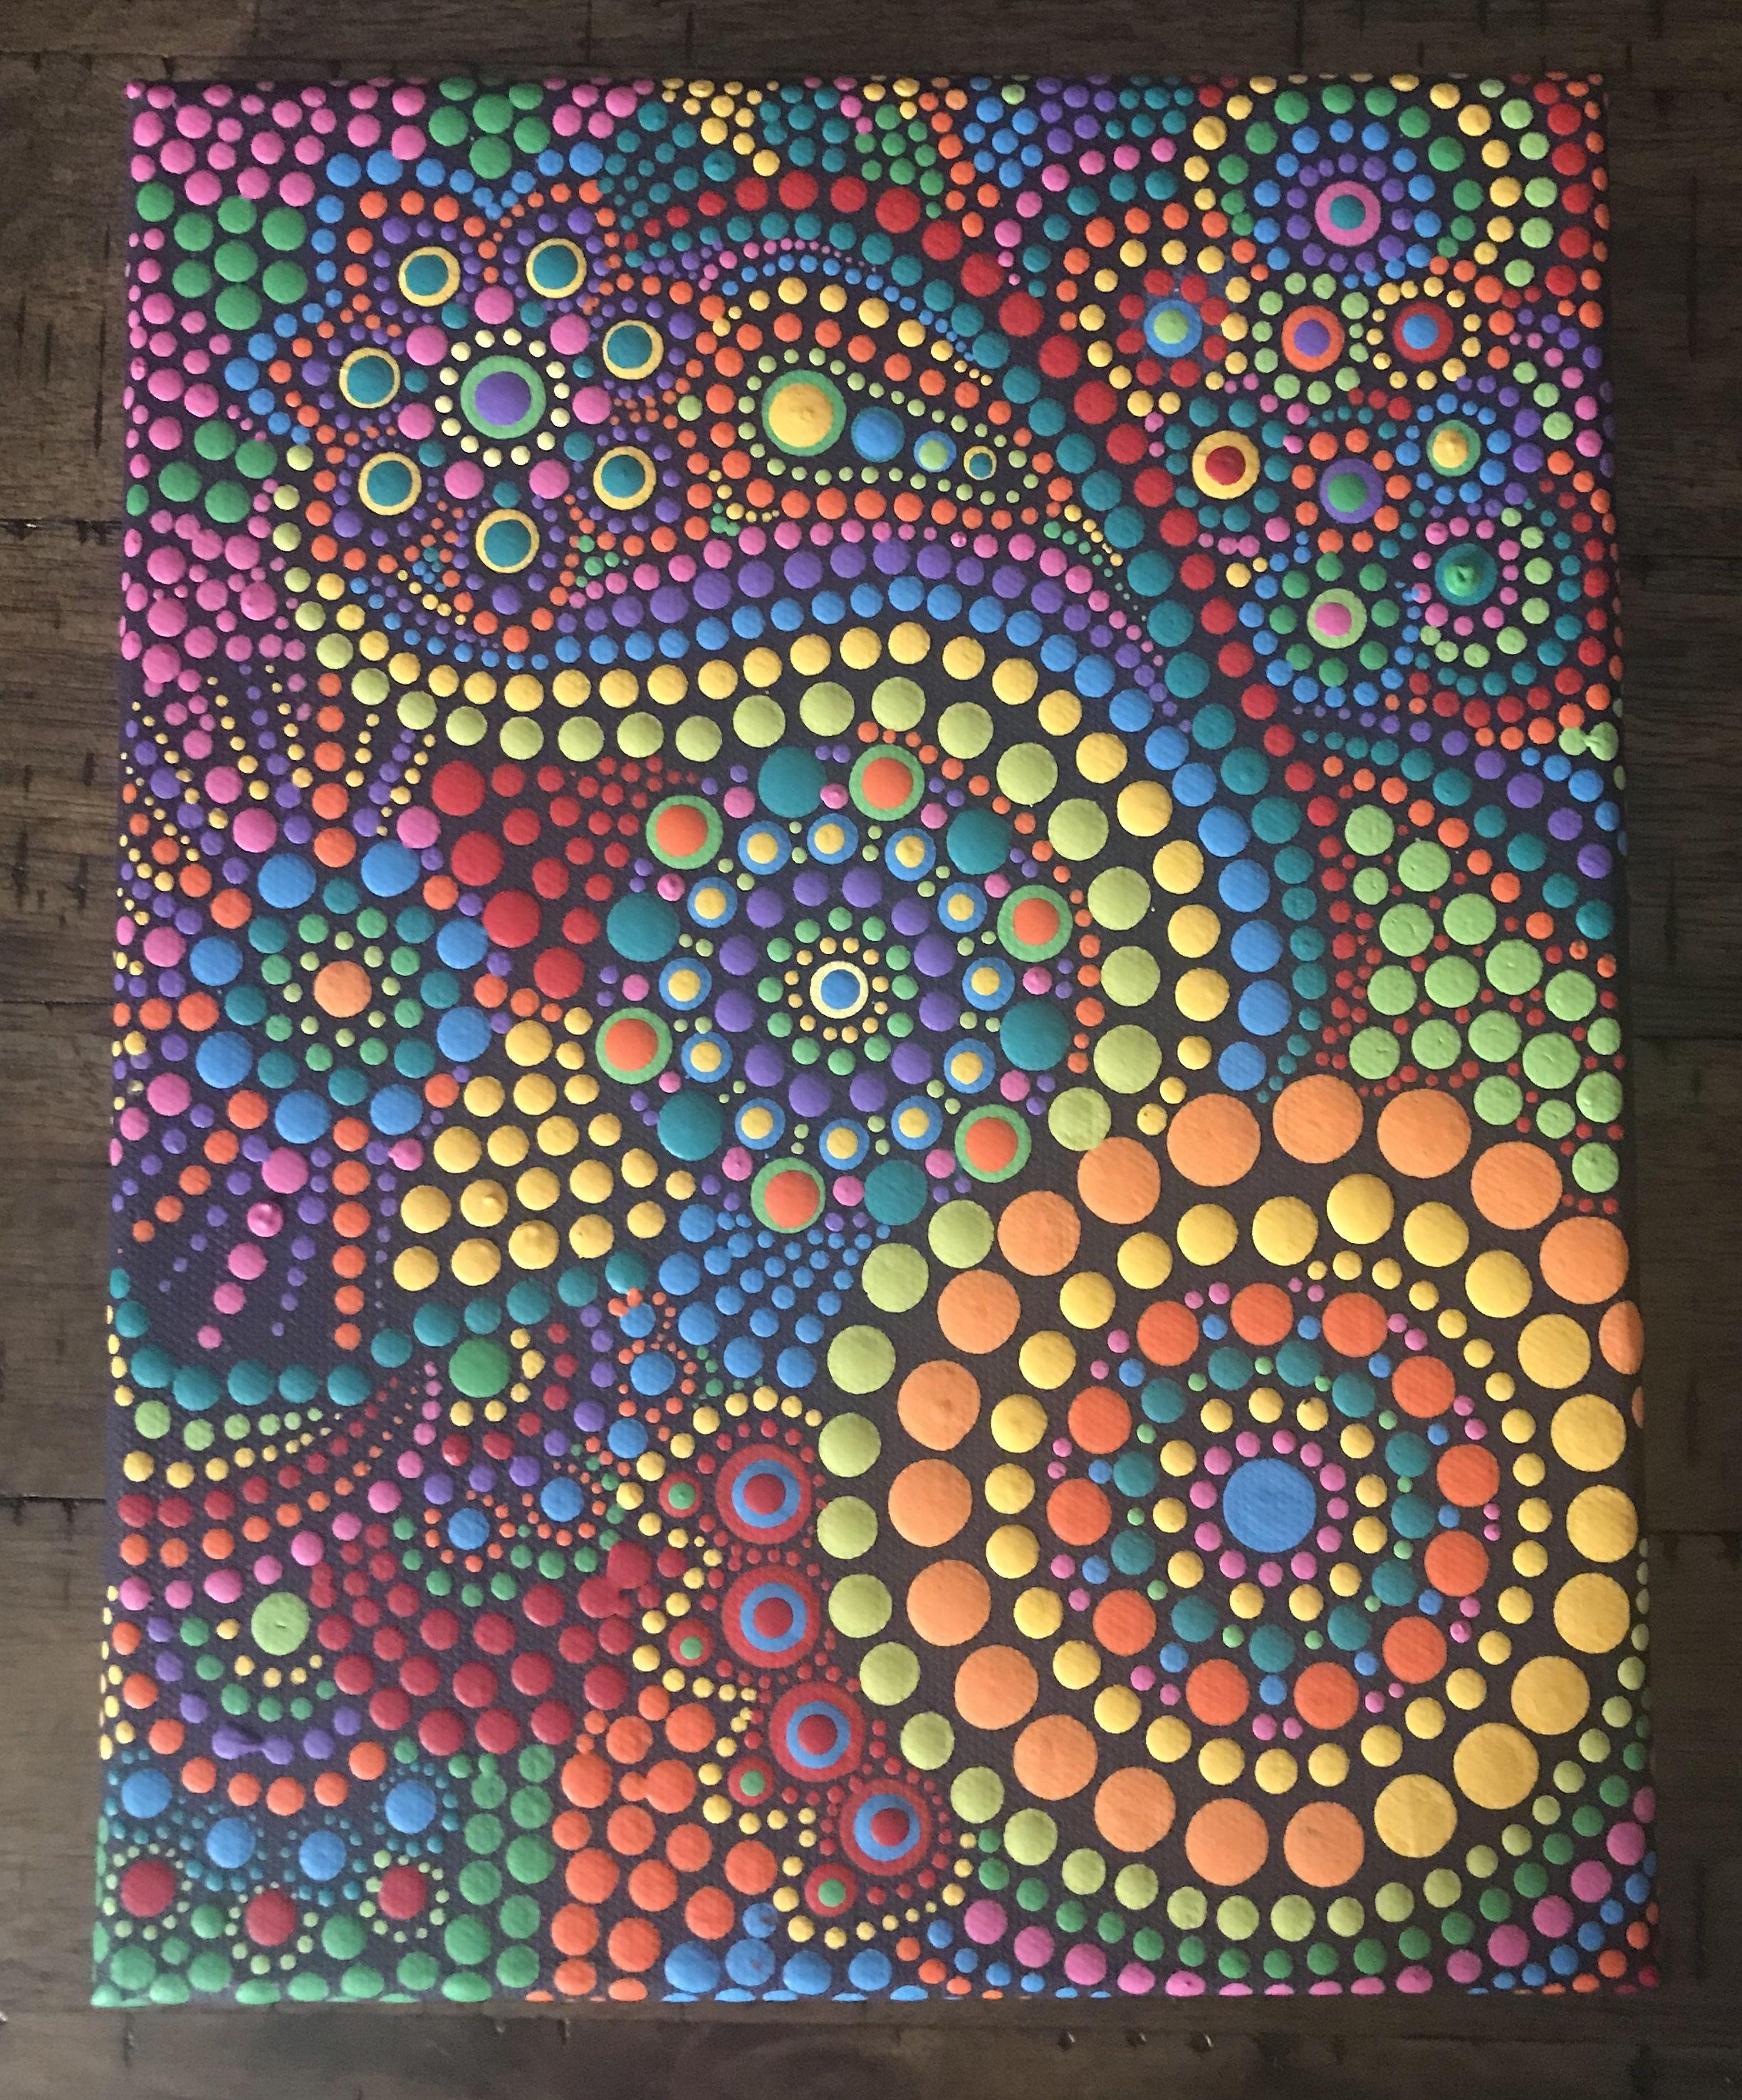 dot art crafty crafts pinterest dot art painting mandala painting and aboriginal dot. Black Bedroom Furniture Sets. Home Design Ideas